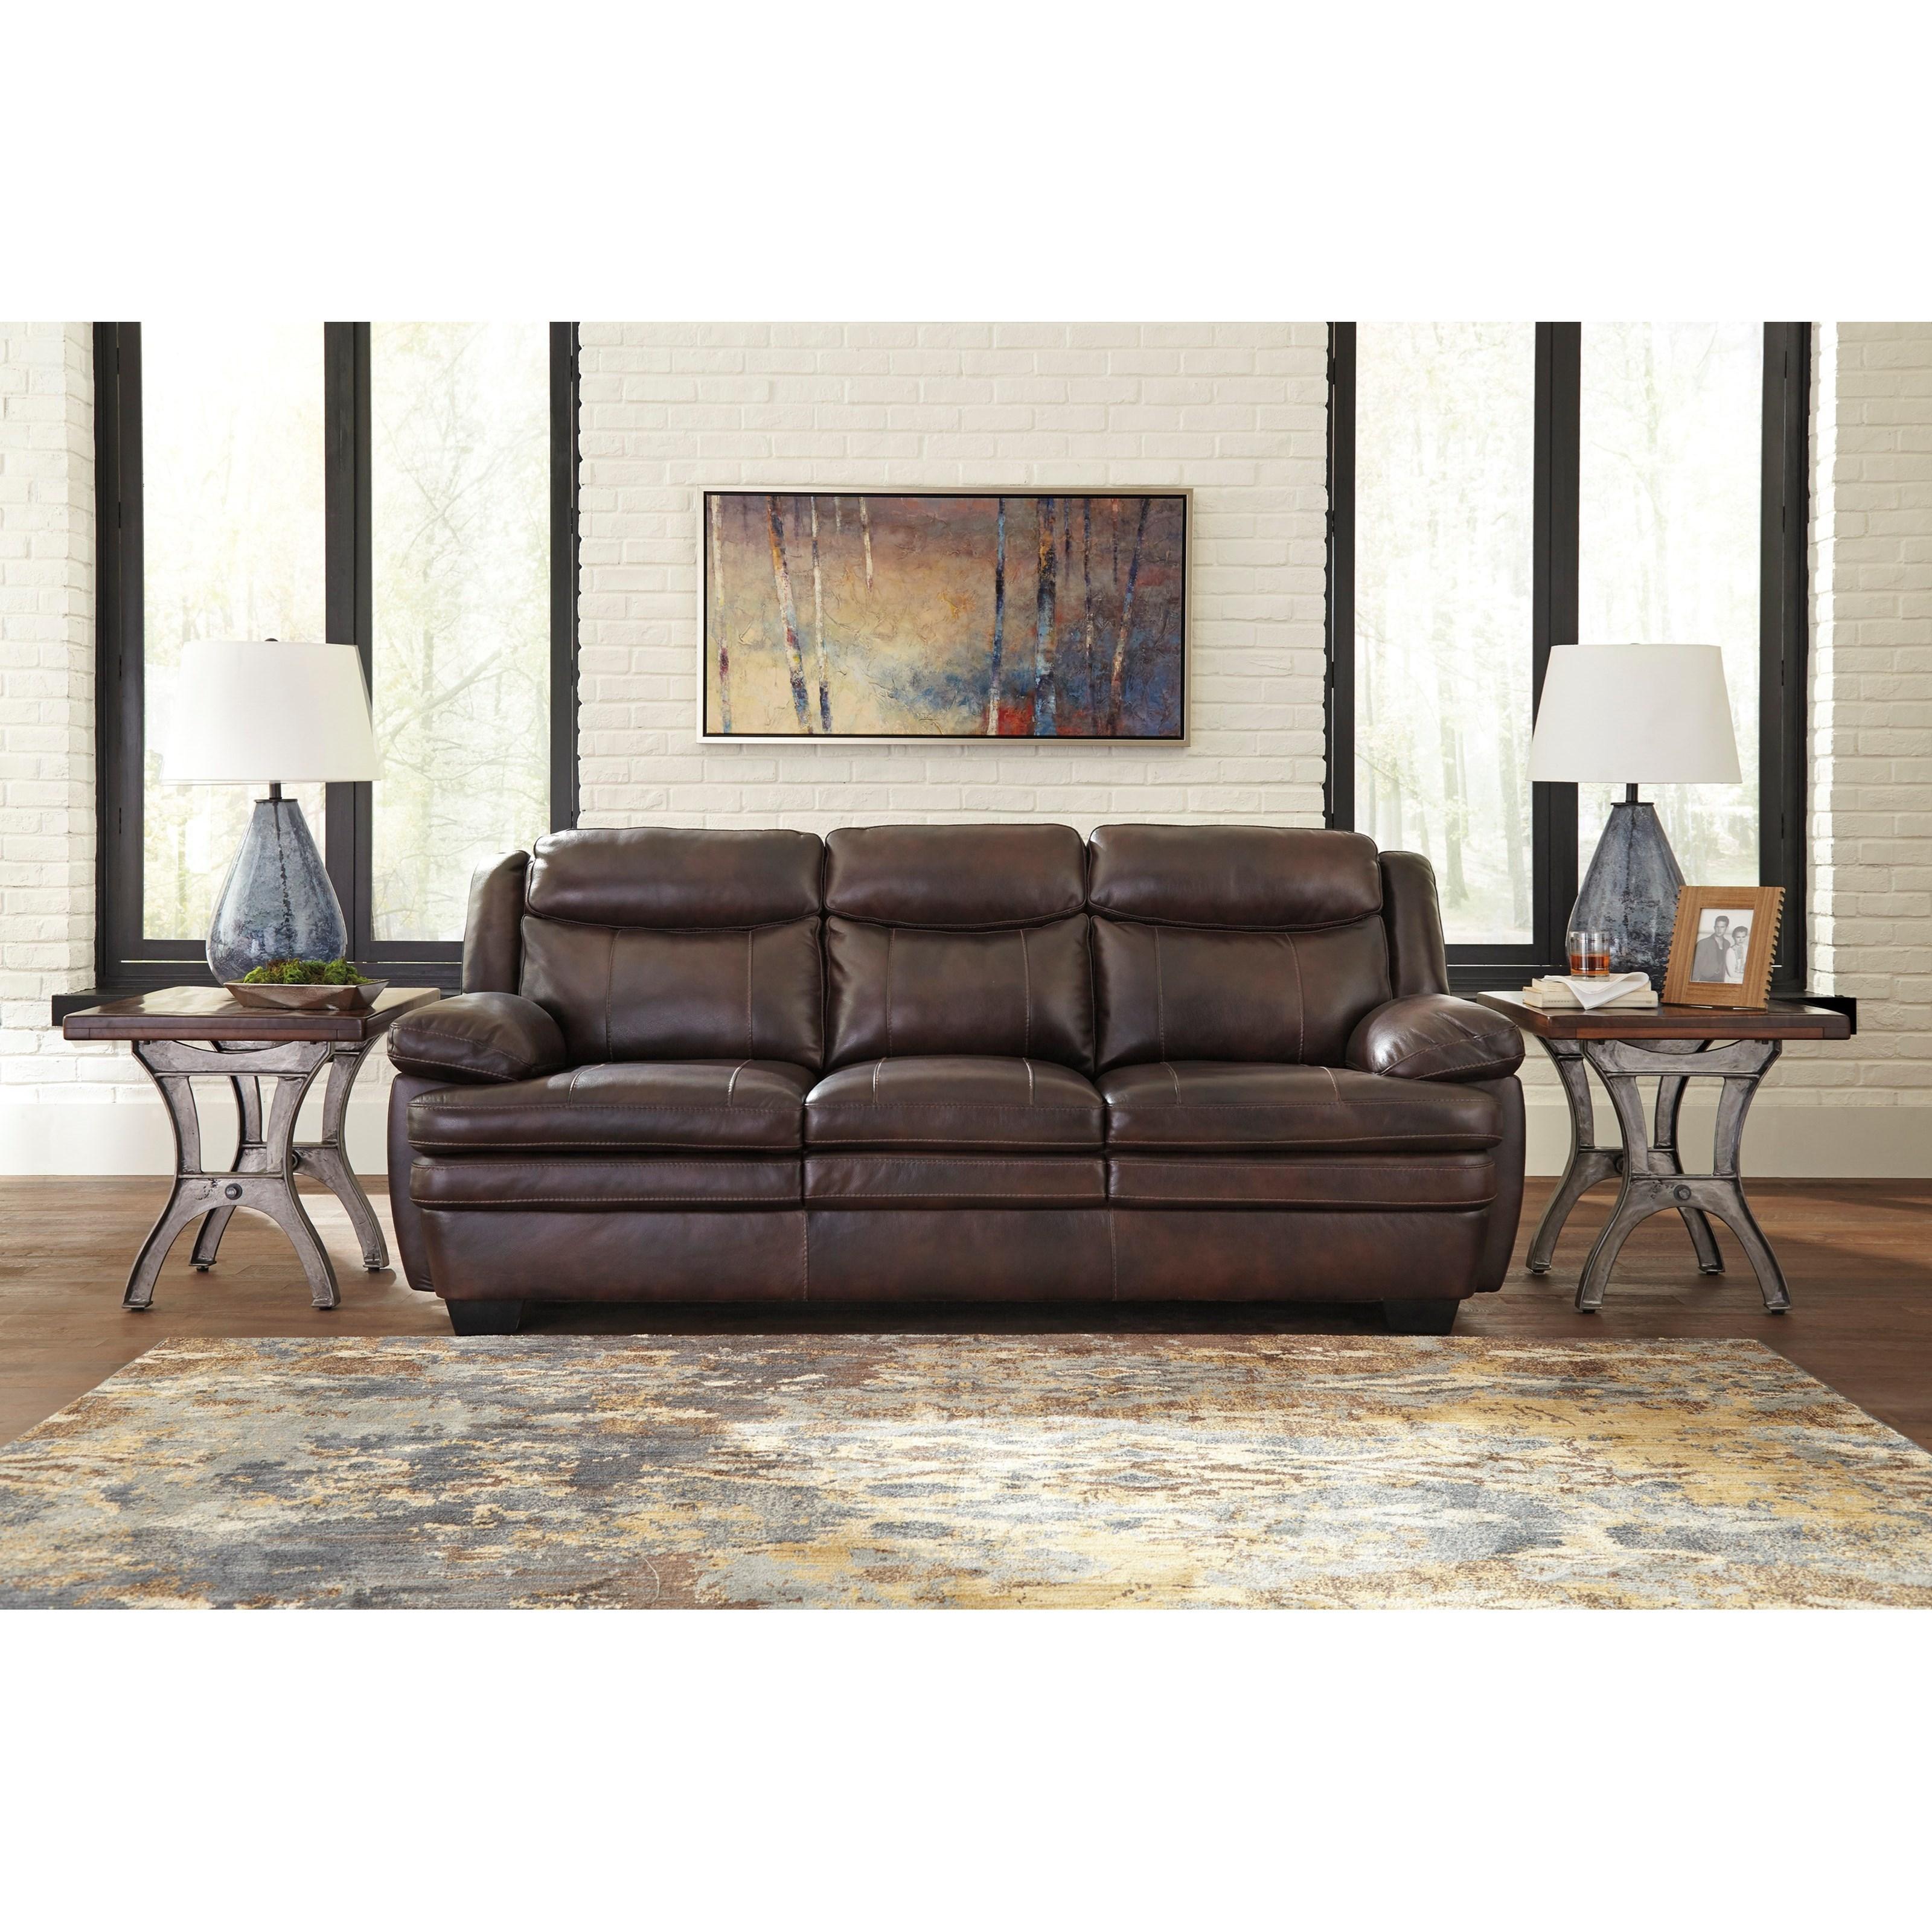 Signature Design By Ashley Hannalore 1530438 Contemporary Leather Match Sofa John V Schultz